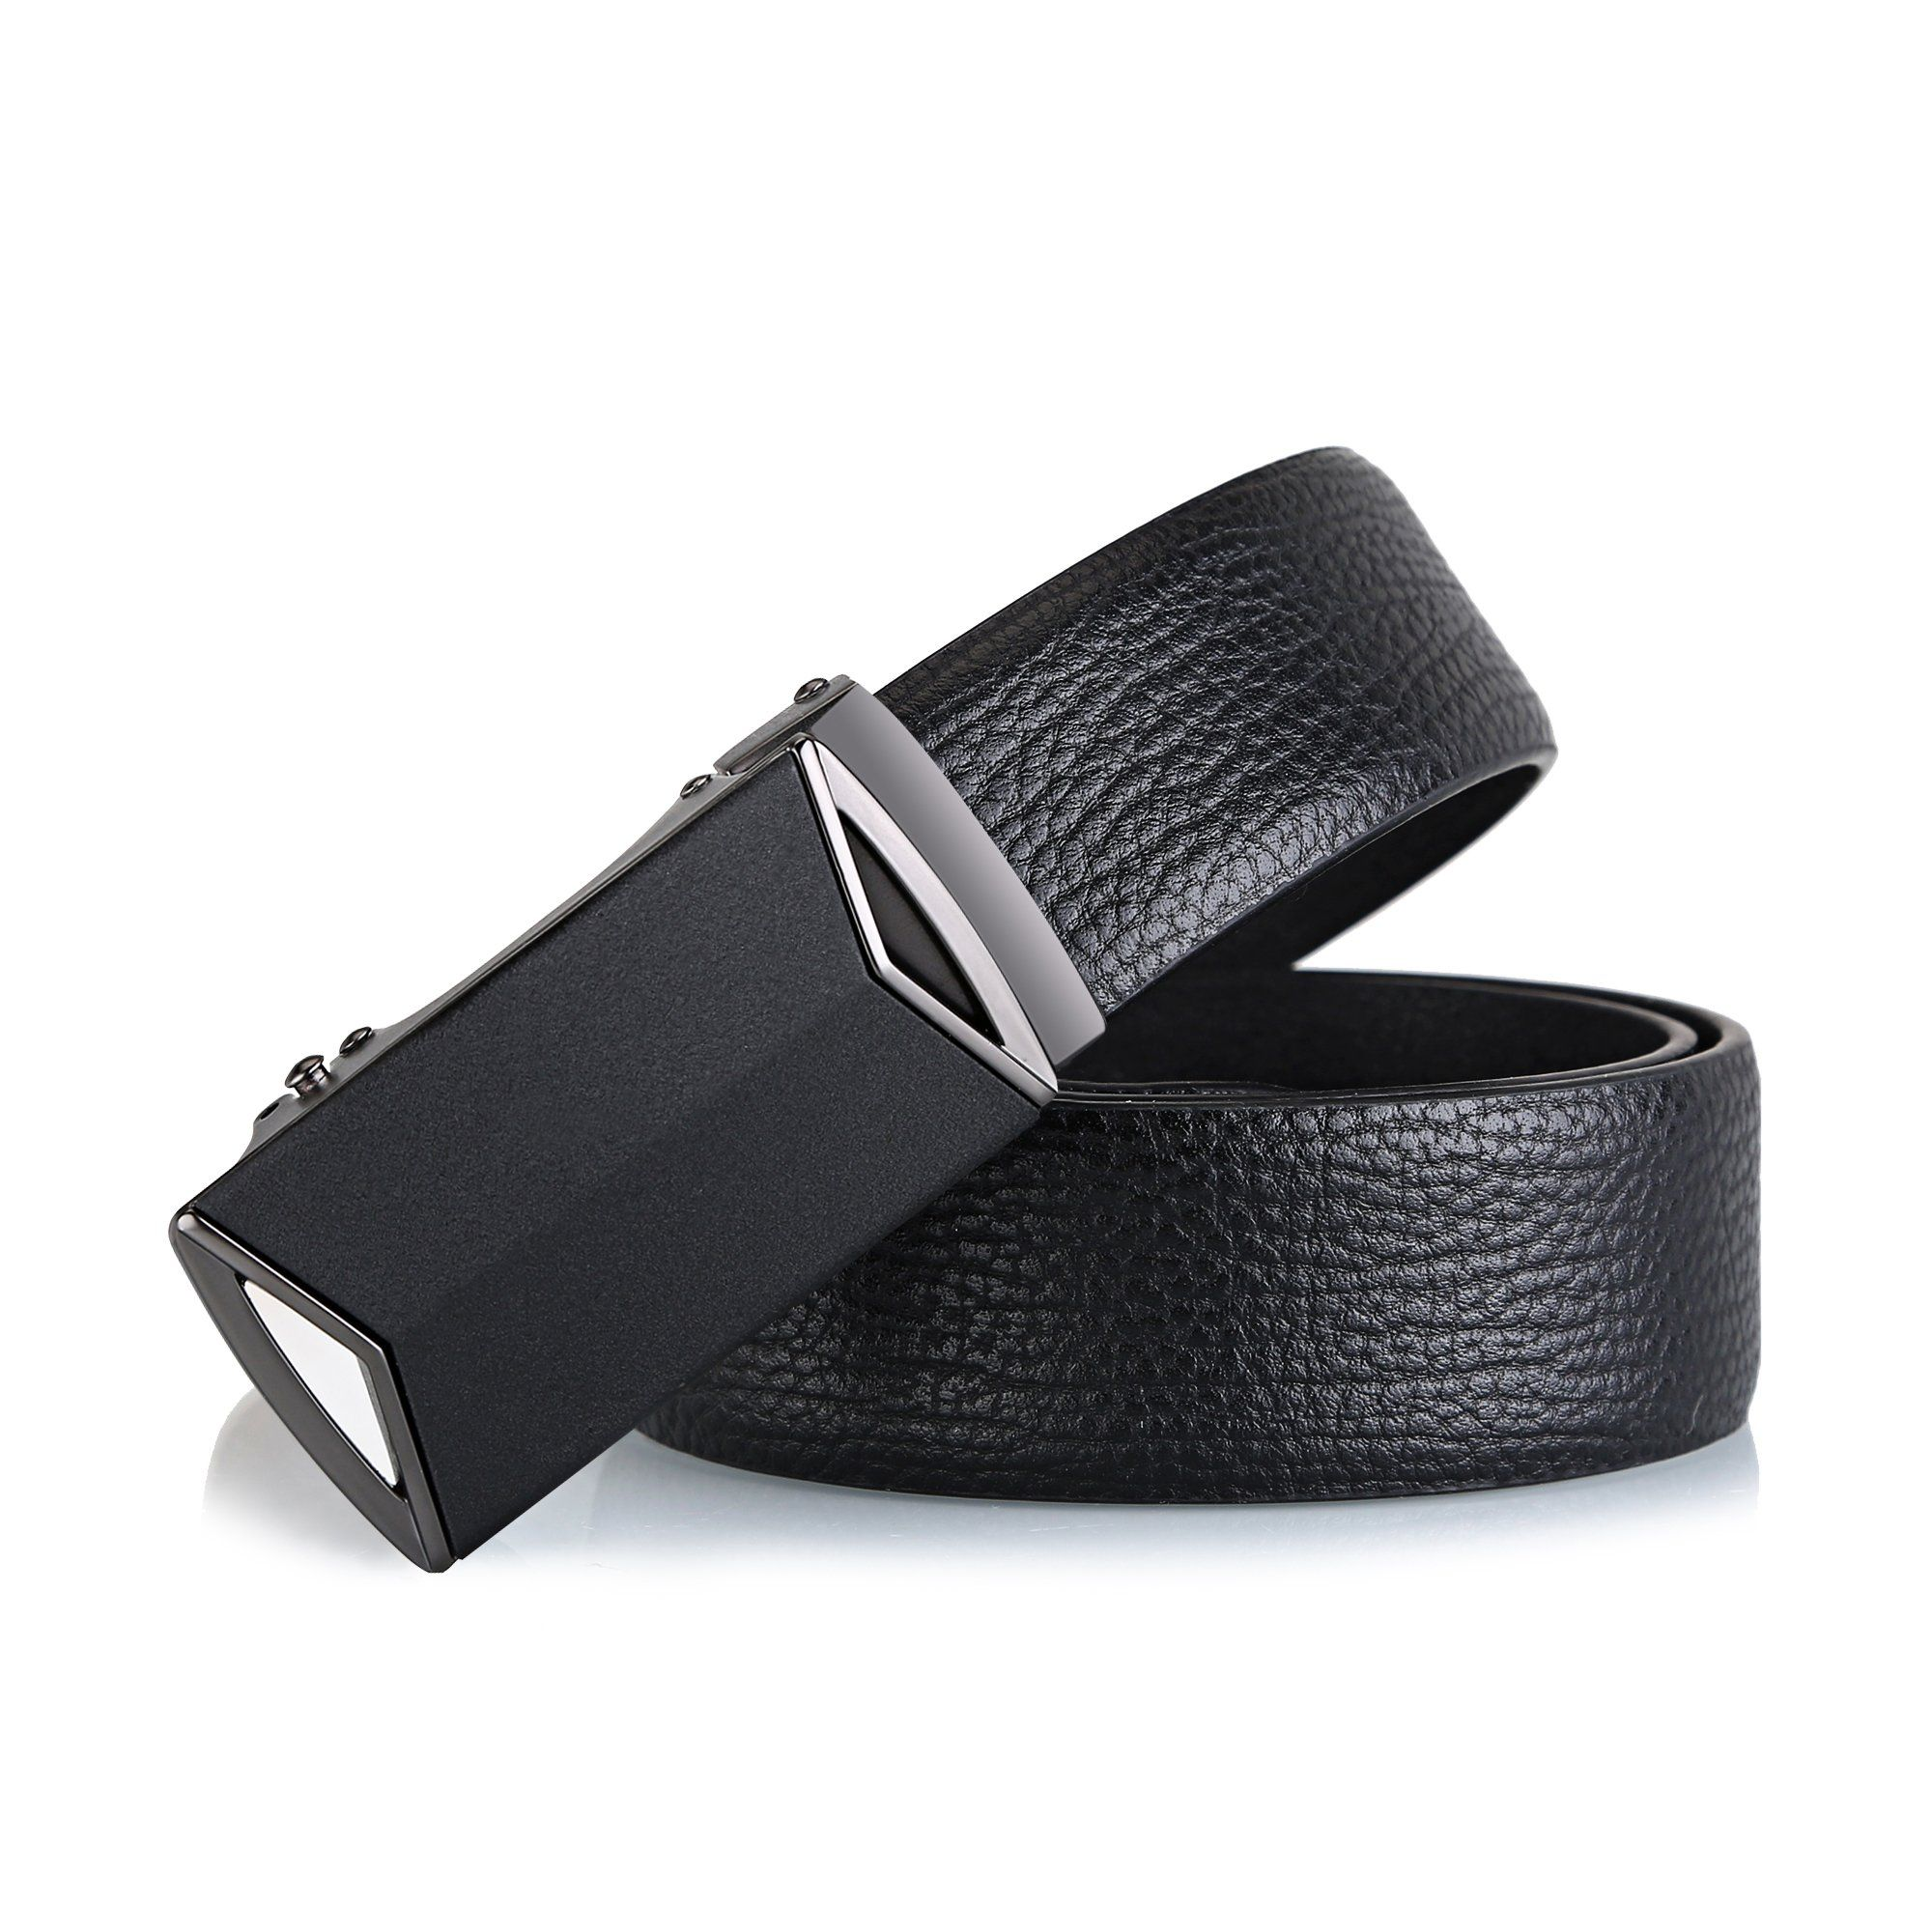 Ratchet Click Belt mens Leather Dress Belt with Automatic